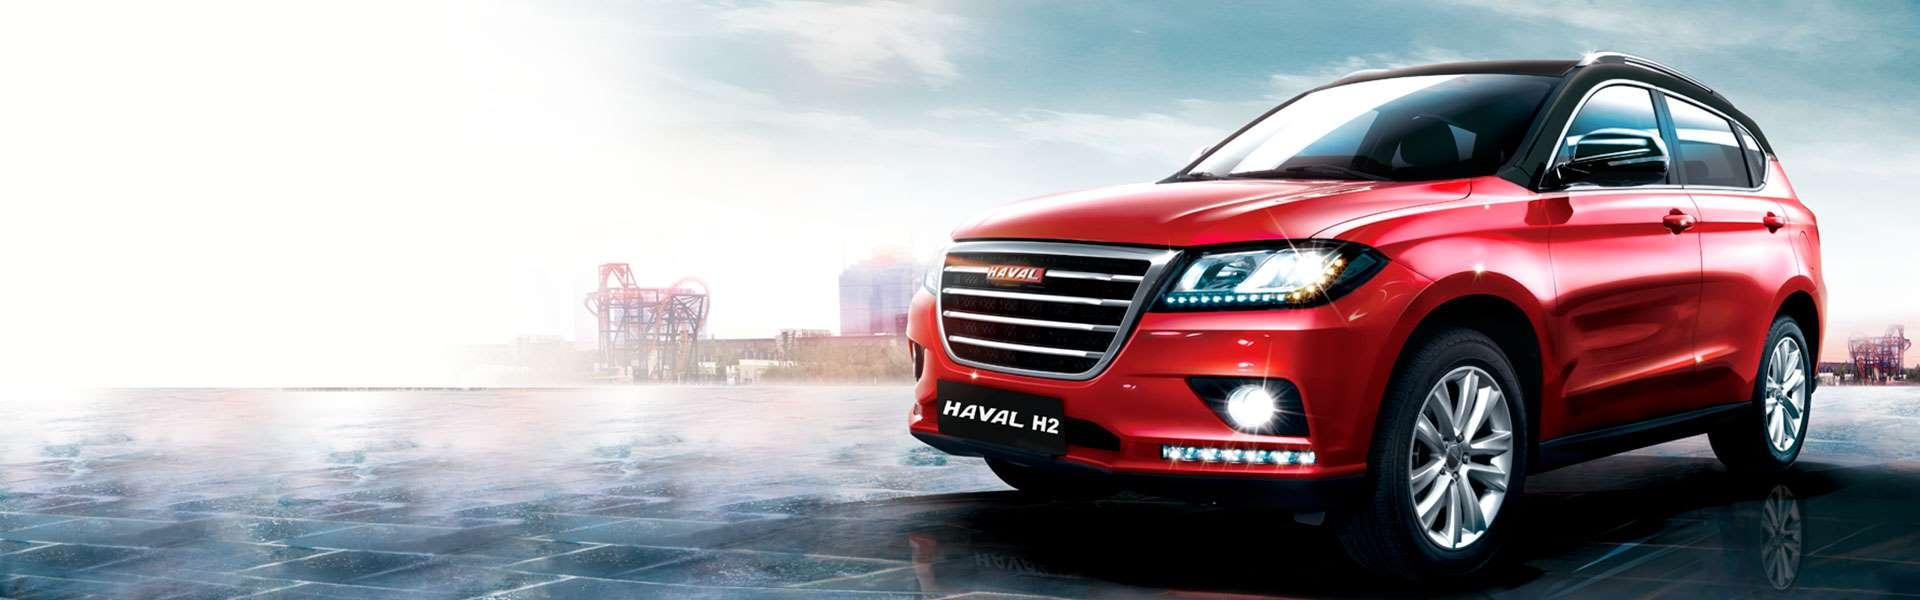 HAVAL H2 - обзор